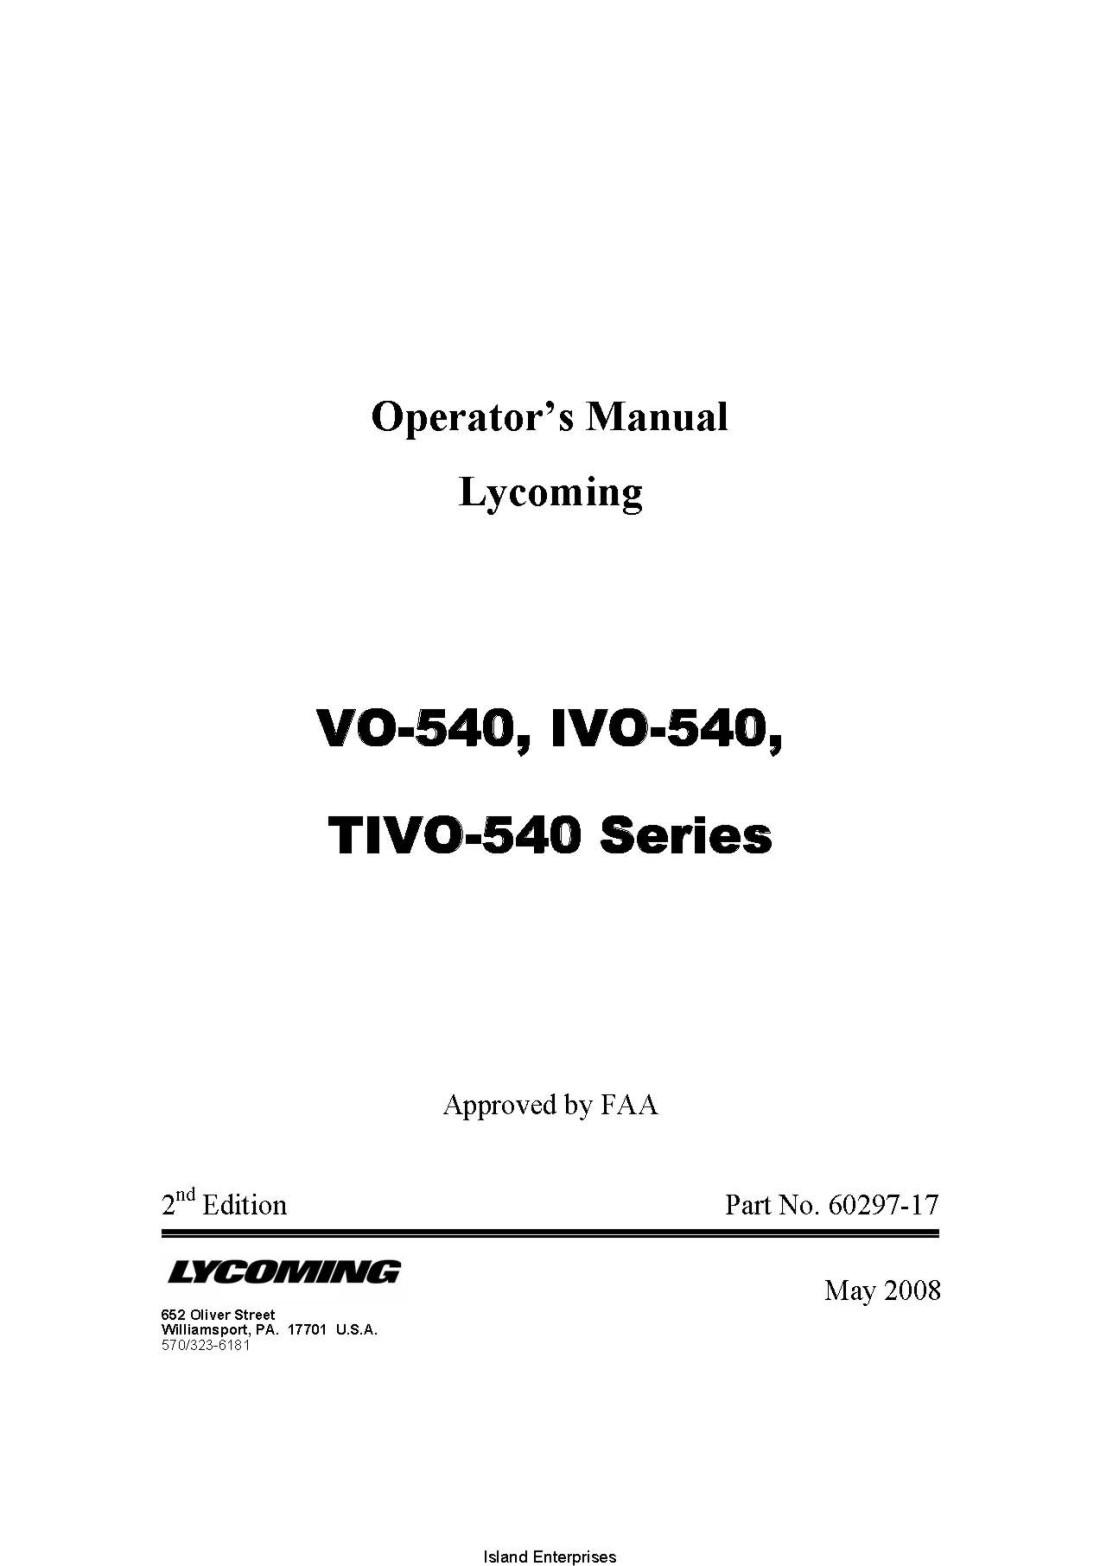 Lycoming VO-540, IVO-540, TIVO-540 Series Operator's